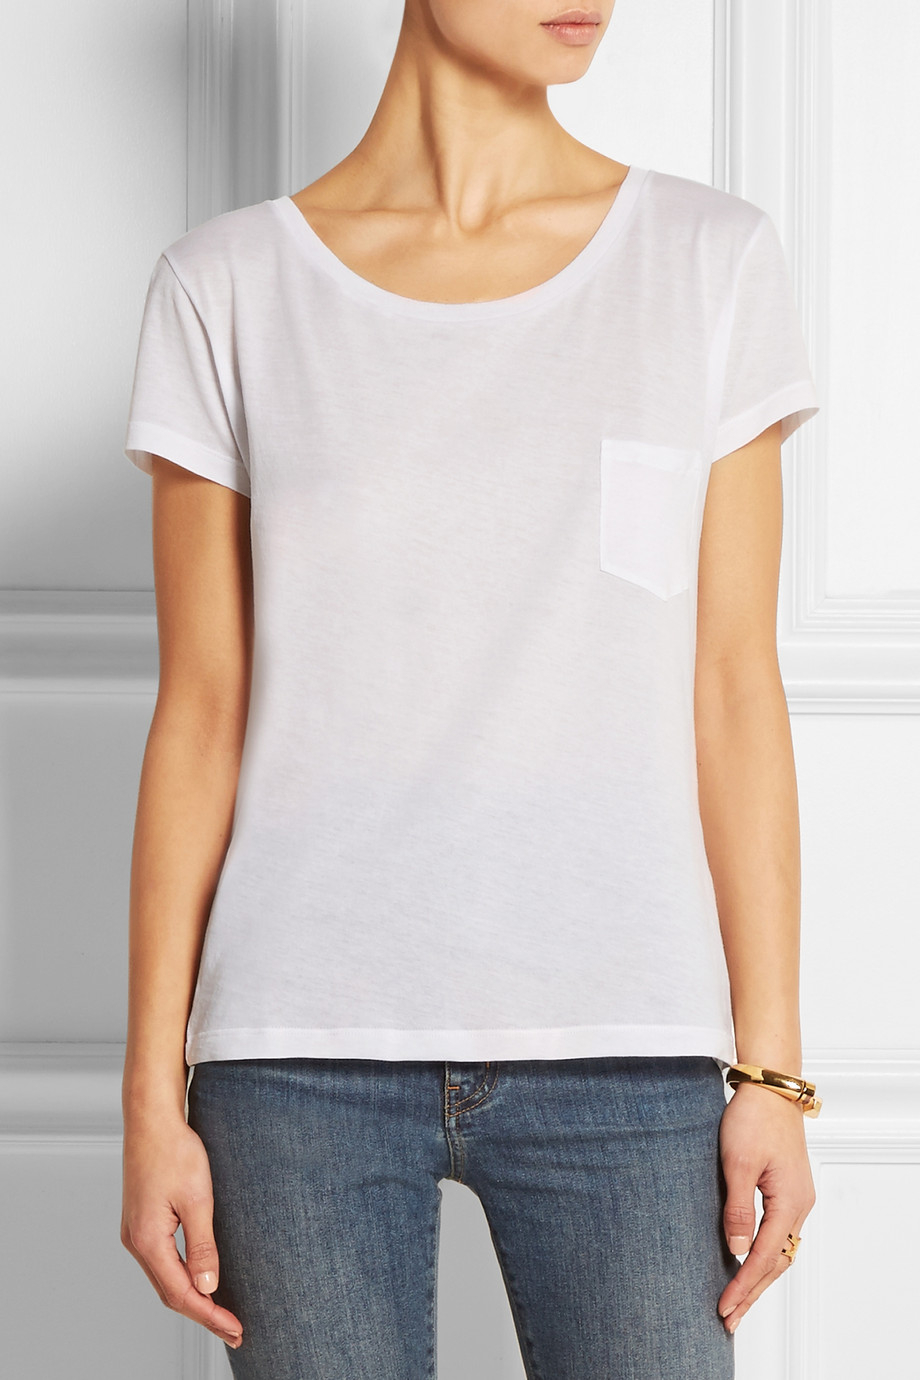 lyst saint laurent cotton jersey t shirt in white. Black Bedroom Furniture Sets. Home Design Ideas